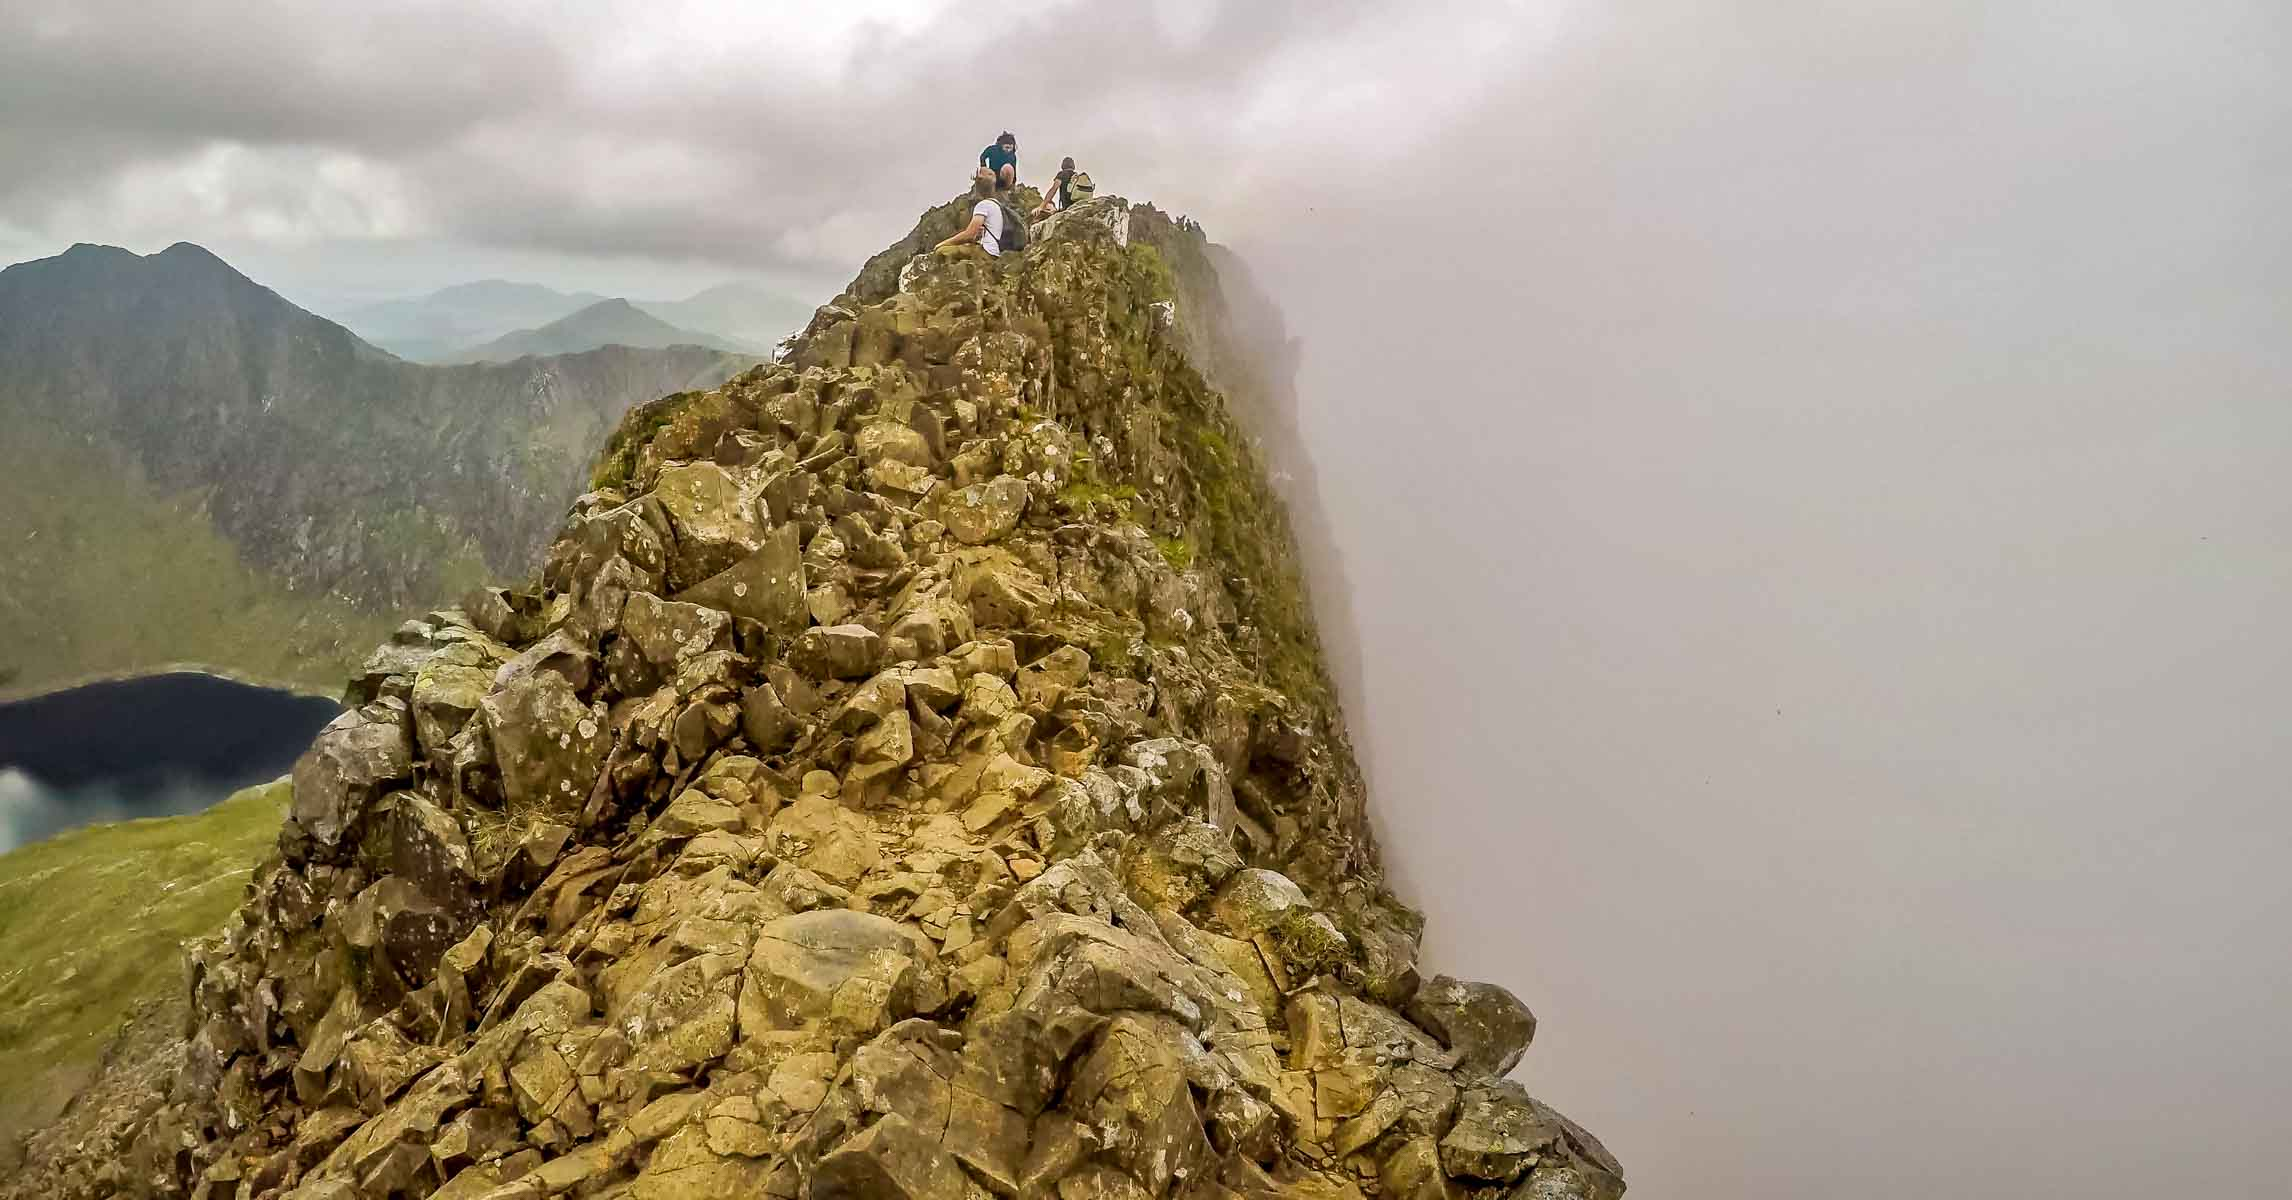 fullsizeoutput_122e Crib Goch - One of Britain's Greatest Ridges